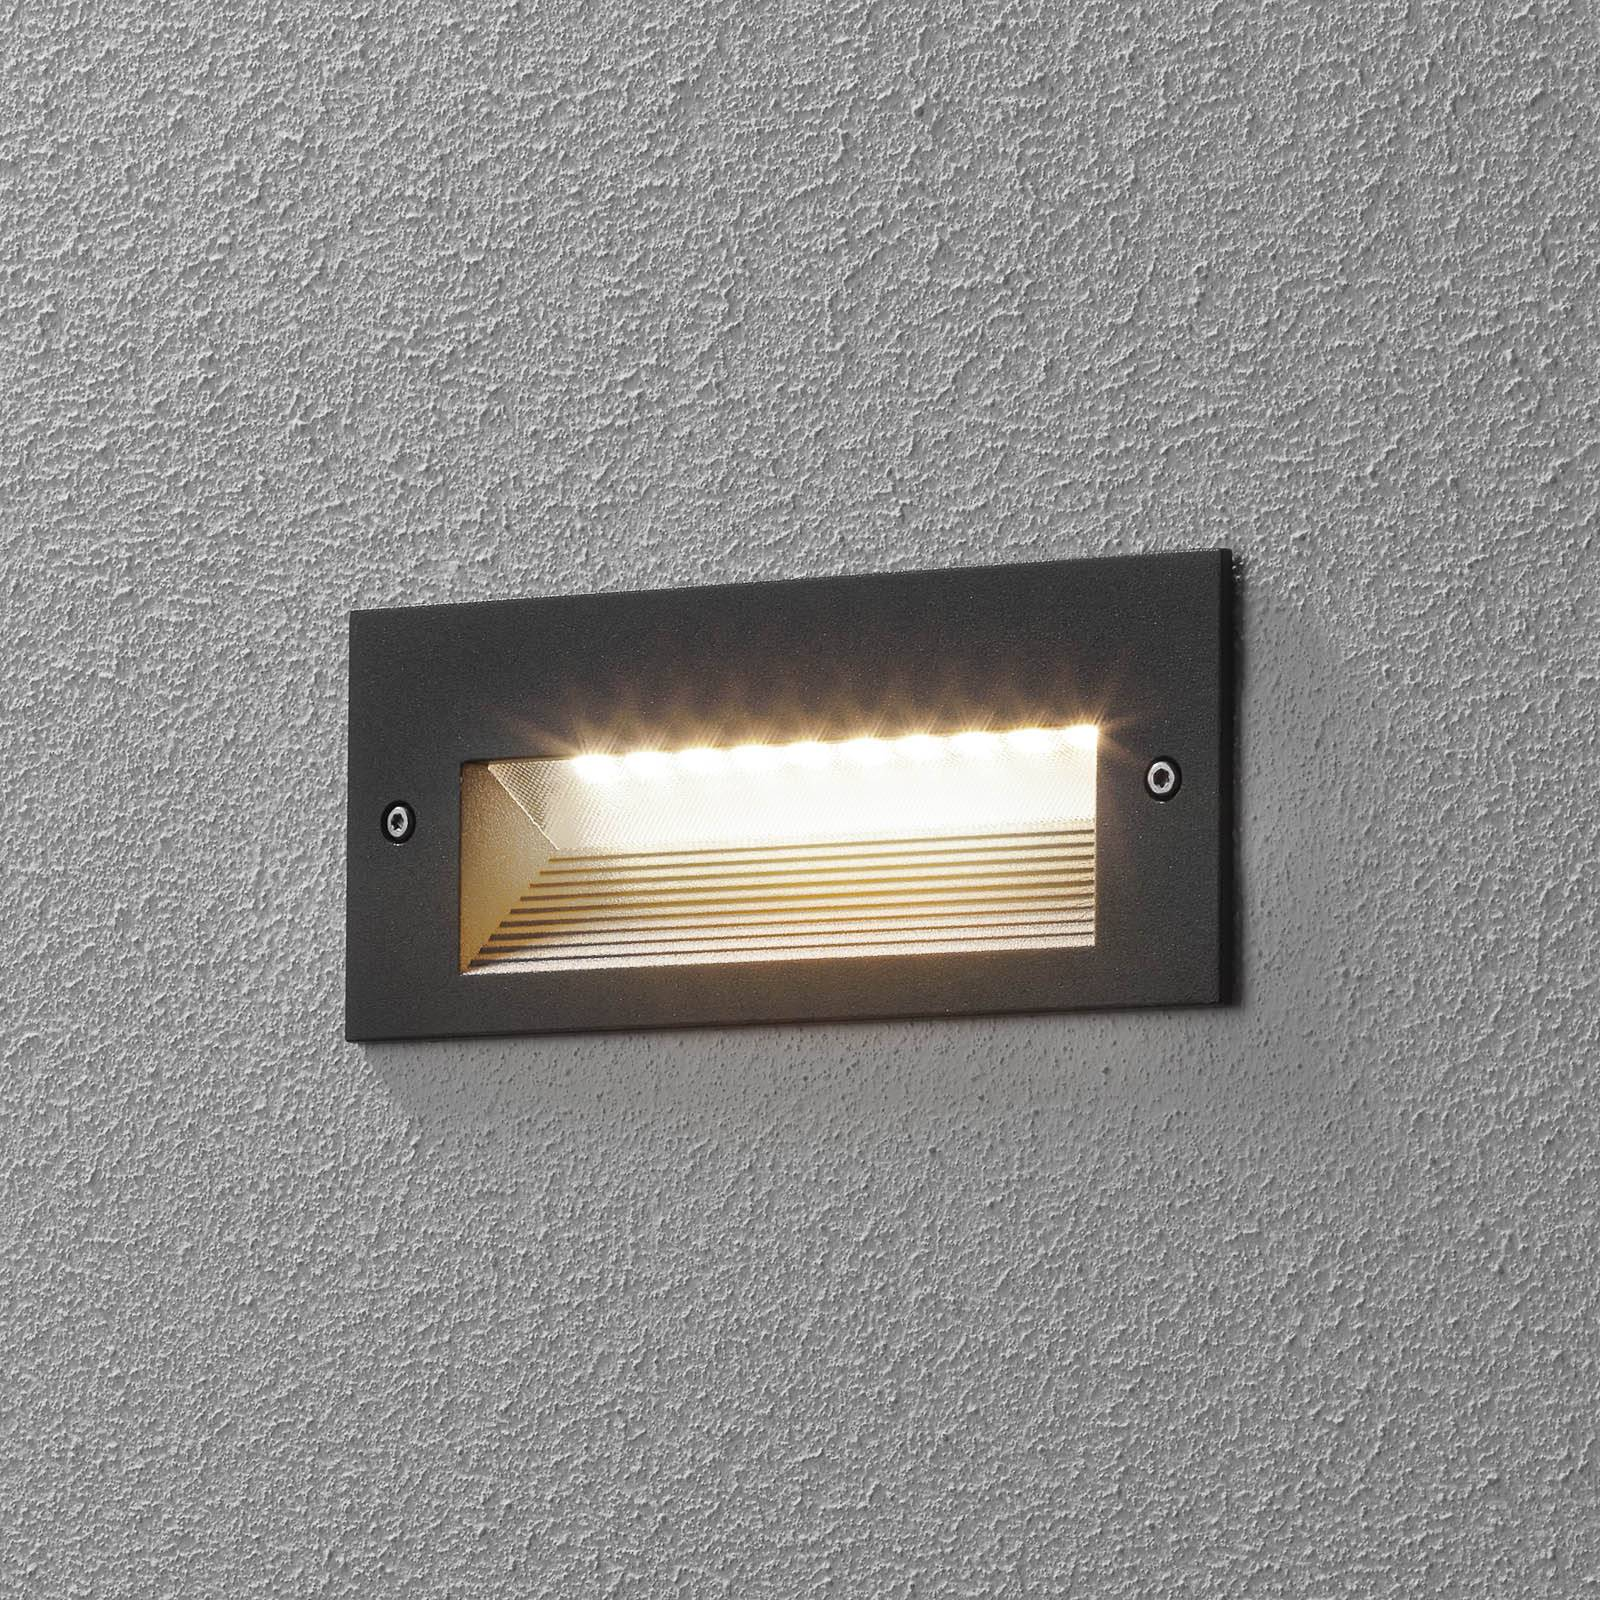 BEGA 33053 LED-seinäuppovalo 3000K grafiitti 17 cm